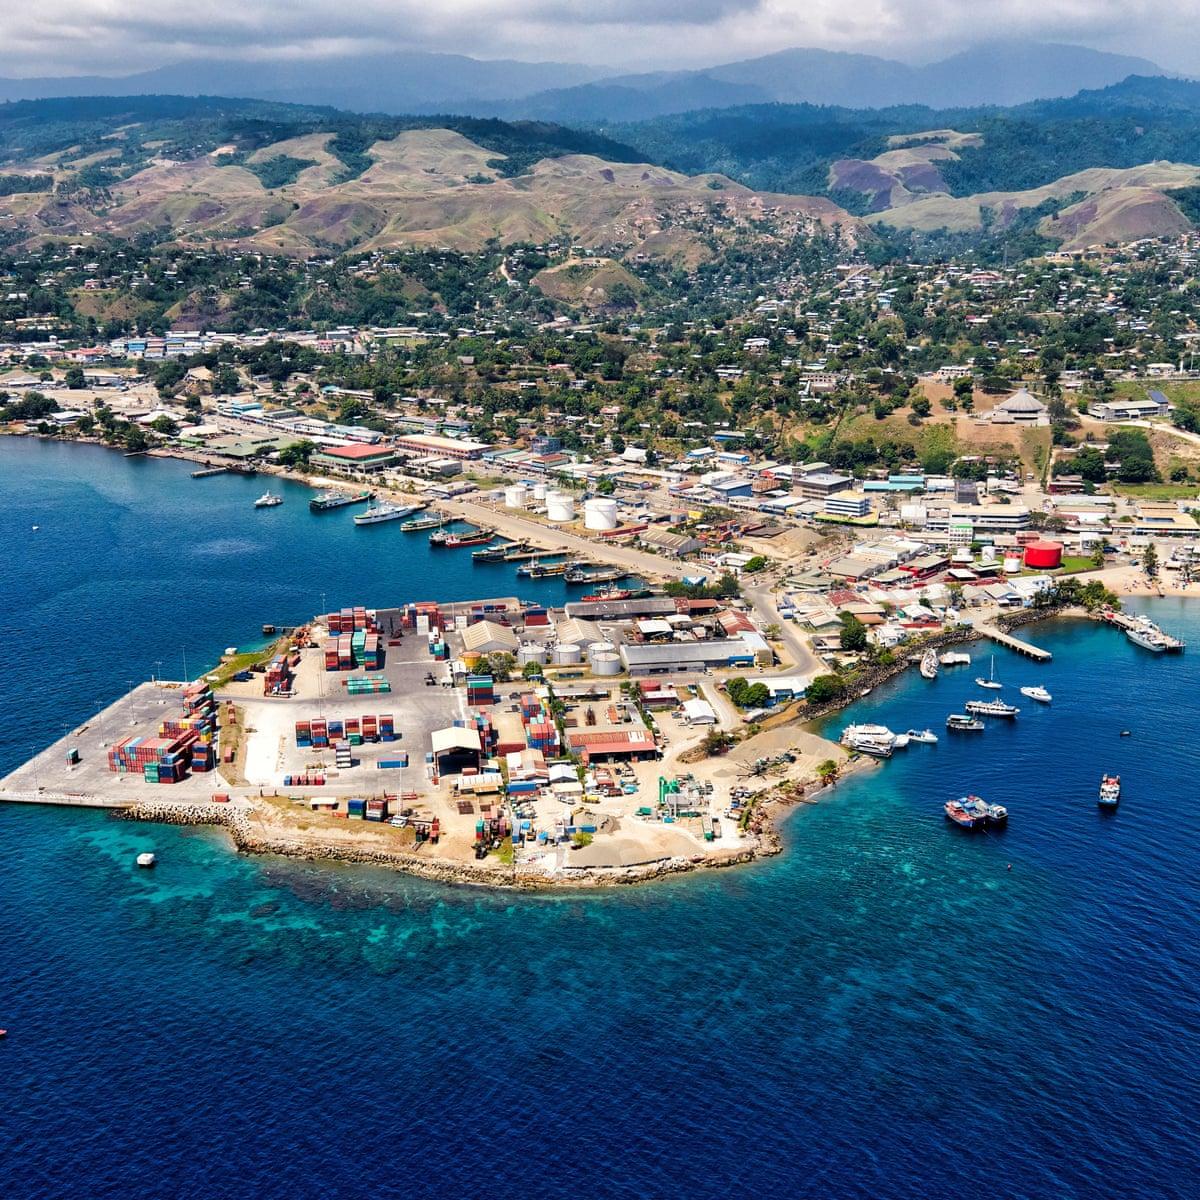 Solomon Islands plans to ban facebook